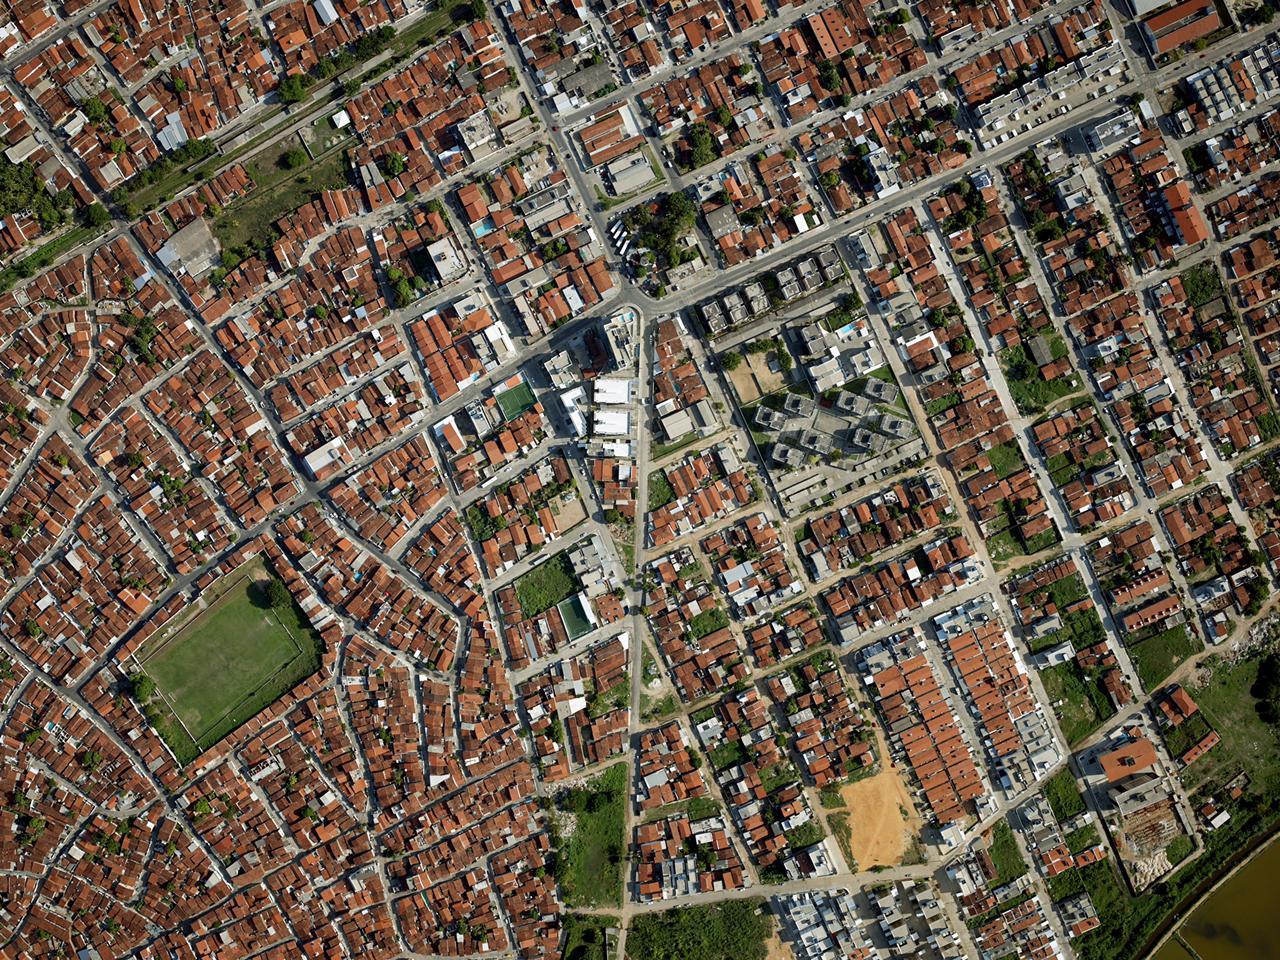 WhatsApp Image 2021 04 27 at 08.56.46 - Prefeitura de Cabedelo realiza projeto inédito de georreferenciamento com mapeamento 3D do município